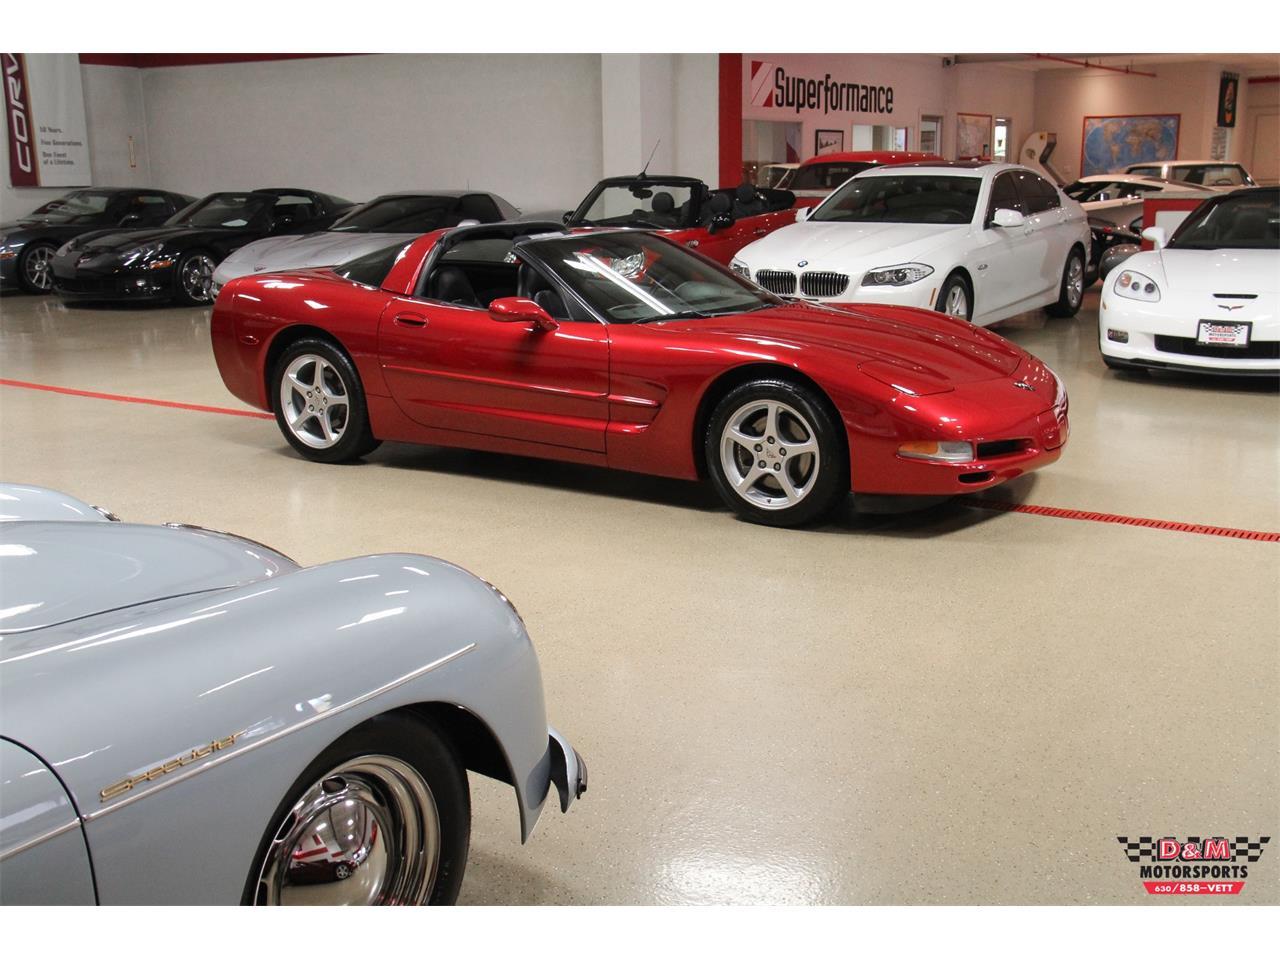 Large Picture of 2000 Corvette located in Illinois - $15,995.00 - LVA3